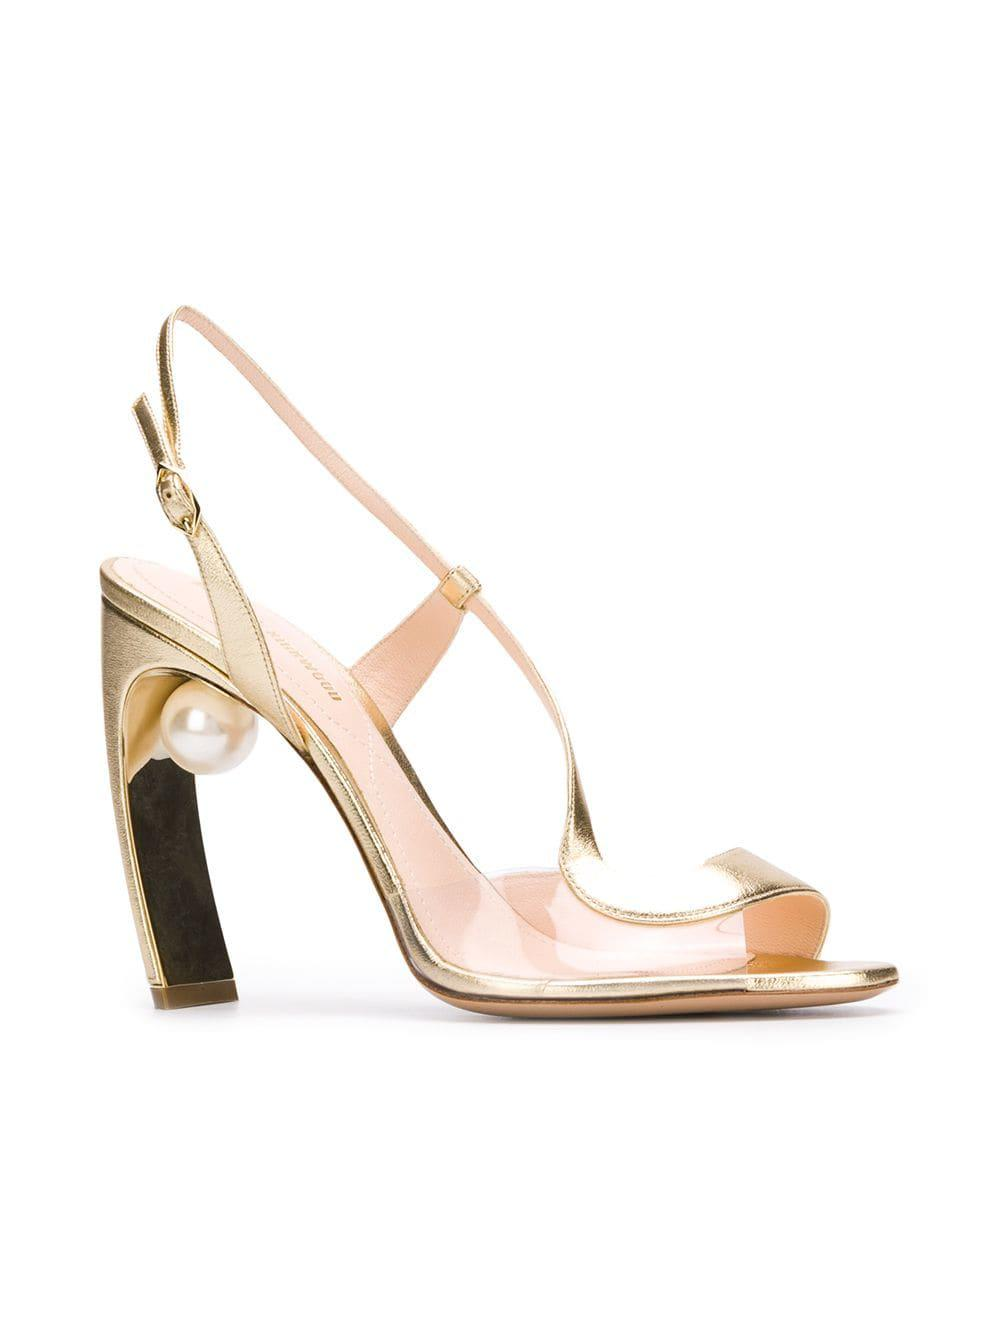 86c3127aaa6a Nicholas Kirkwood Maeva Pearl S Sandals in Metallic - Save  2.3076923076923066% - Lyst